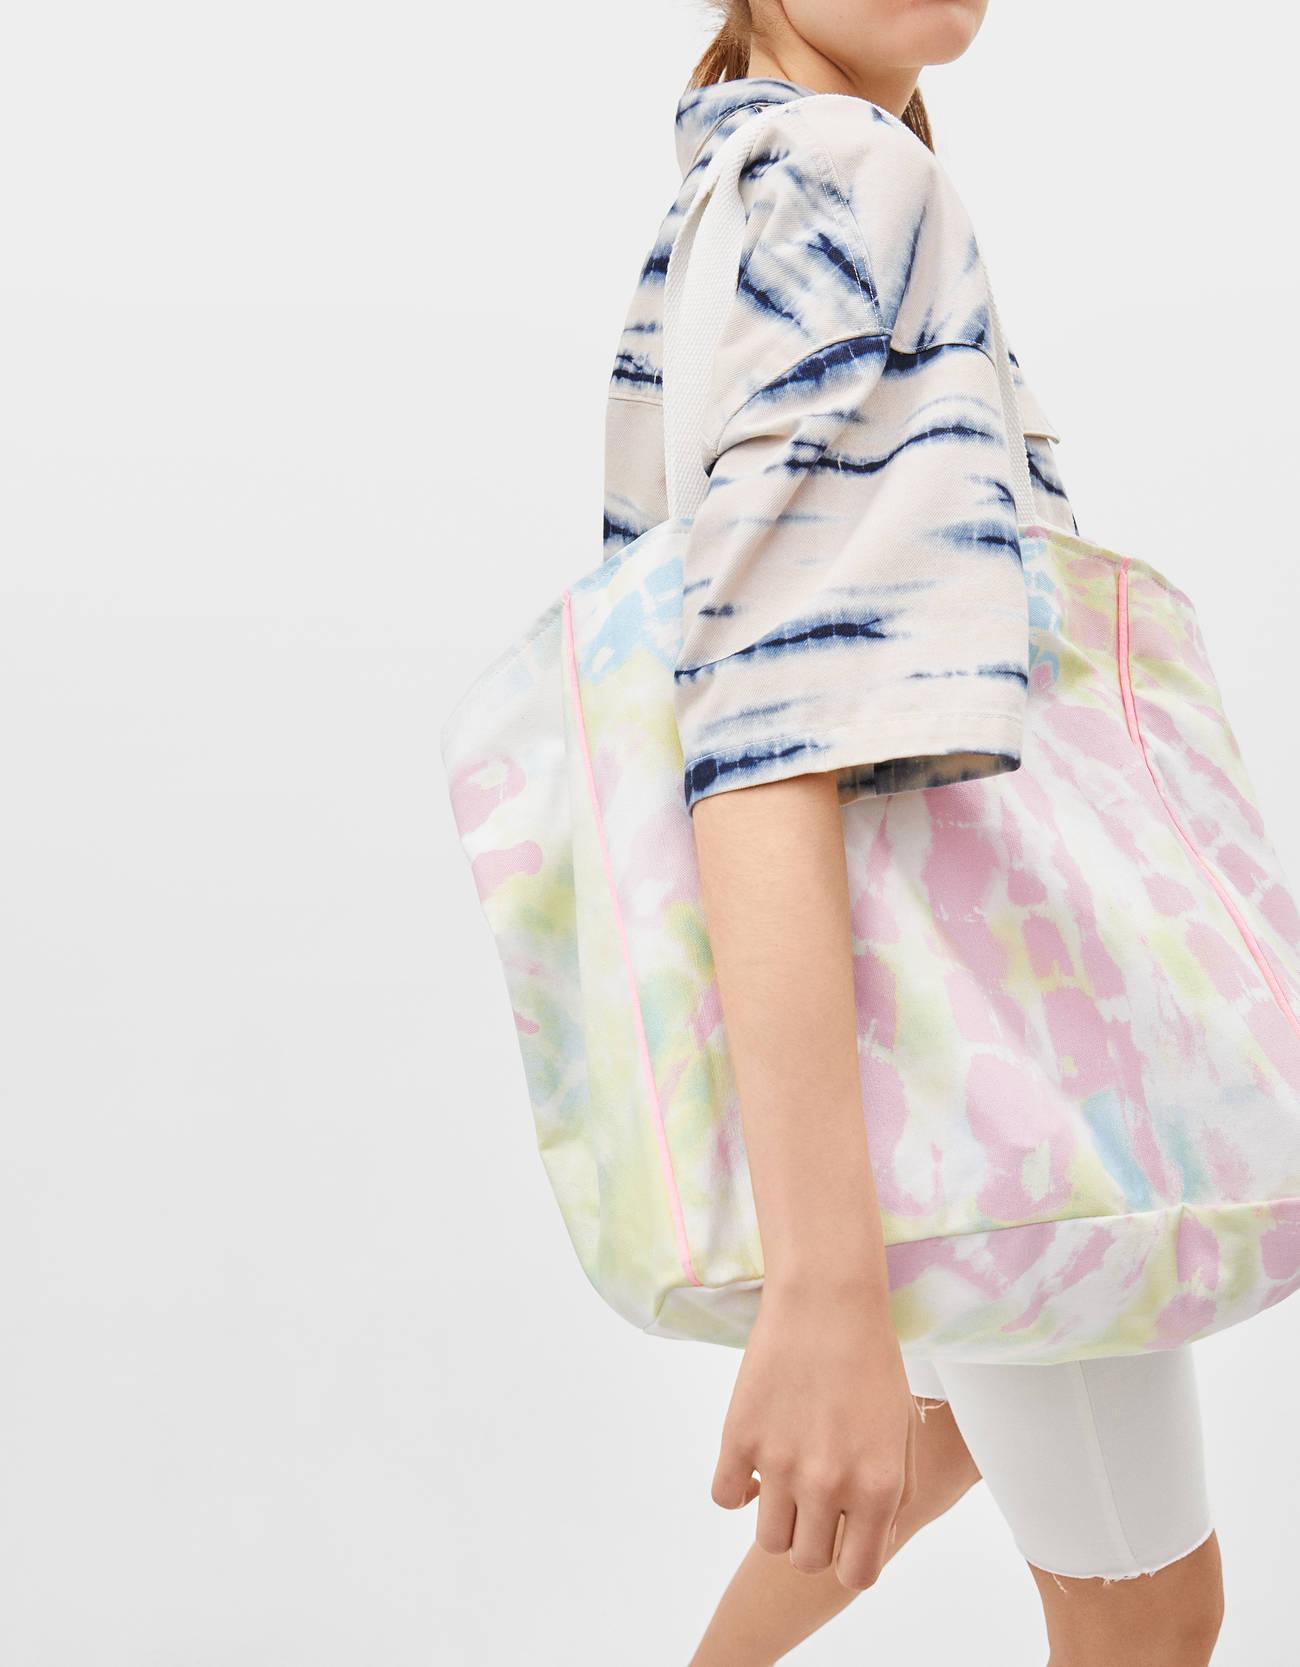 001177bcc Tie-dye tote bag - New - Bershka Serbia